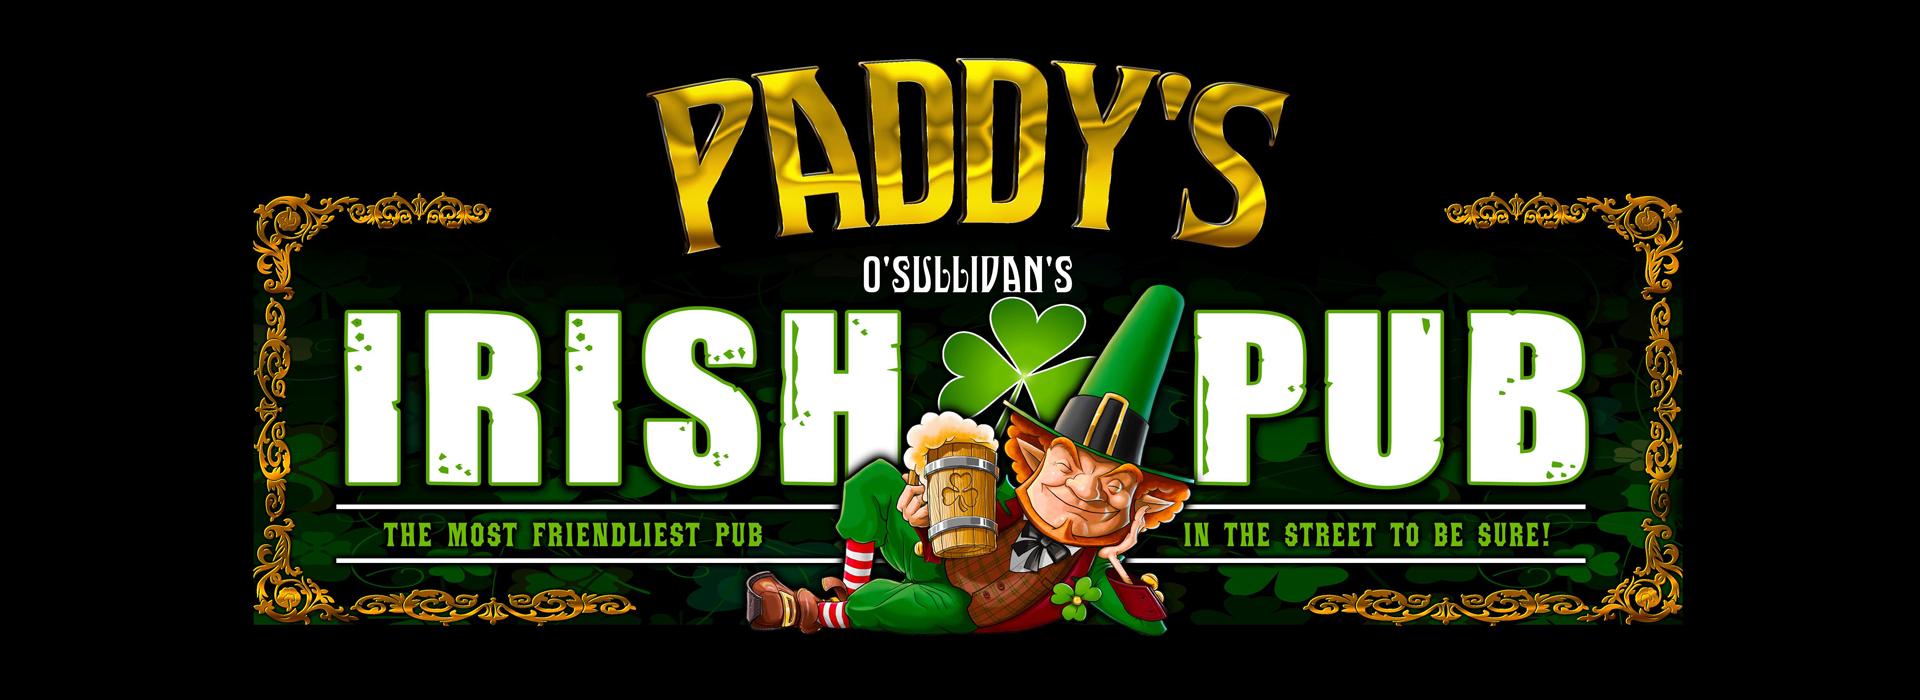 Paddy's Irish Pub with leprechaun